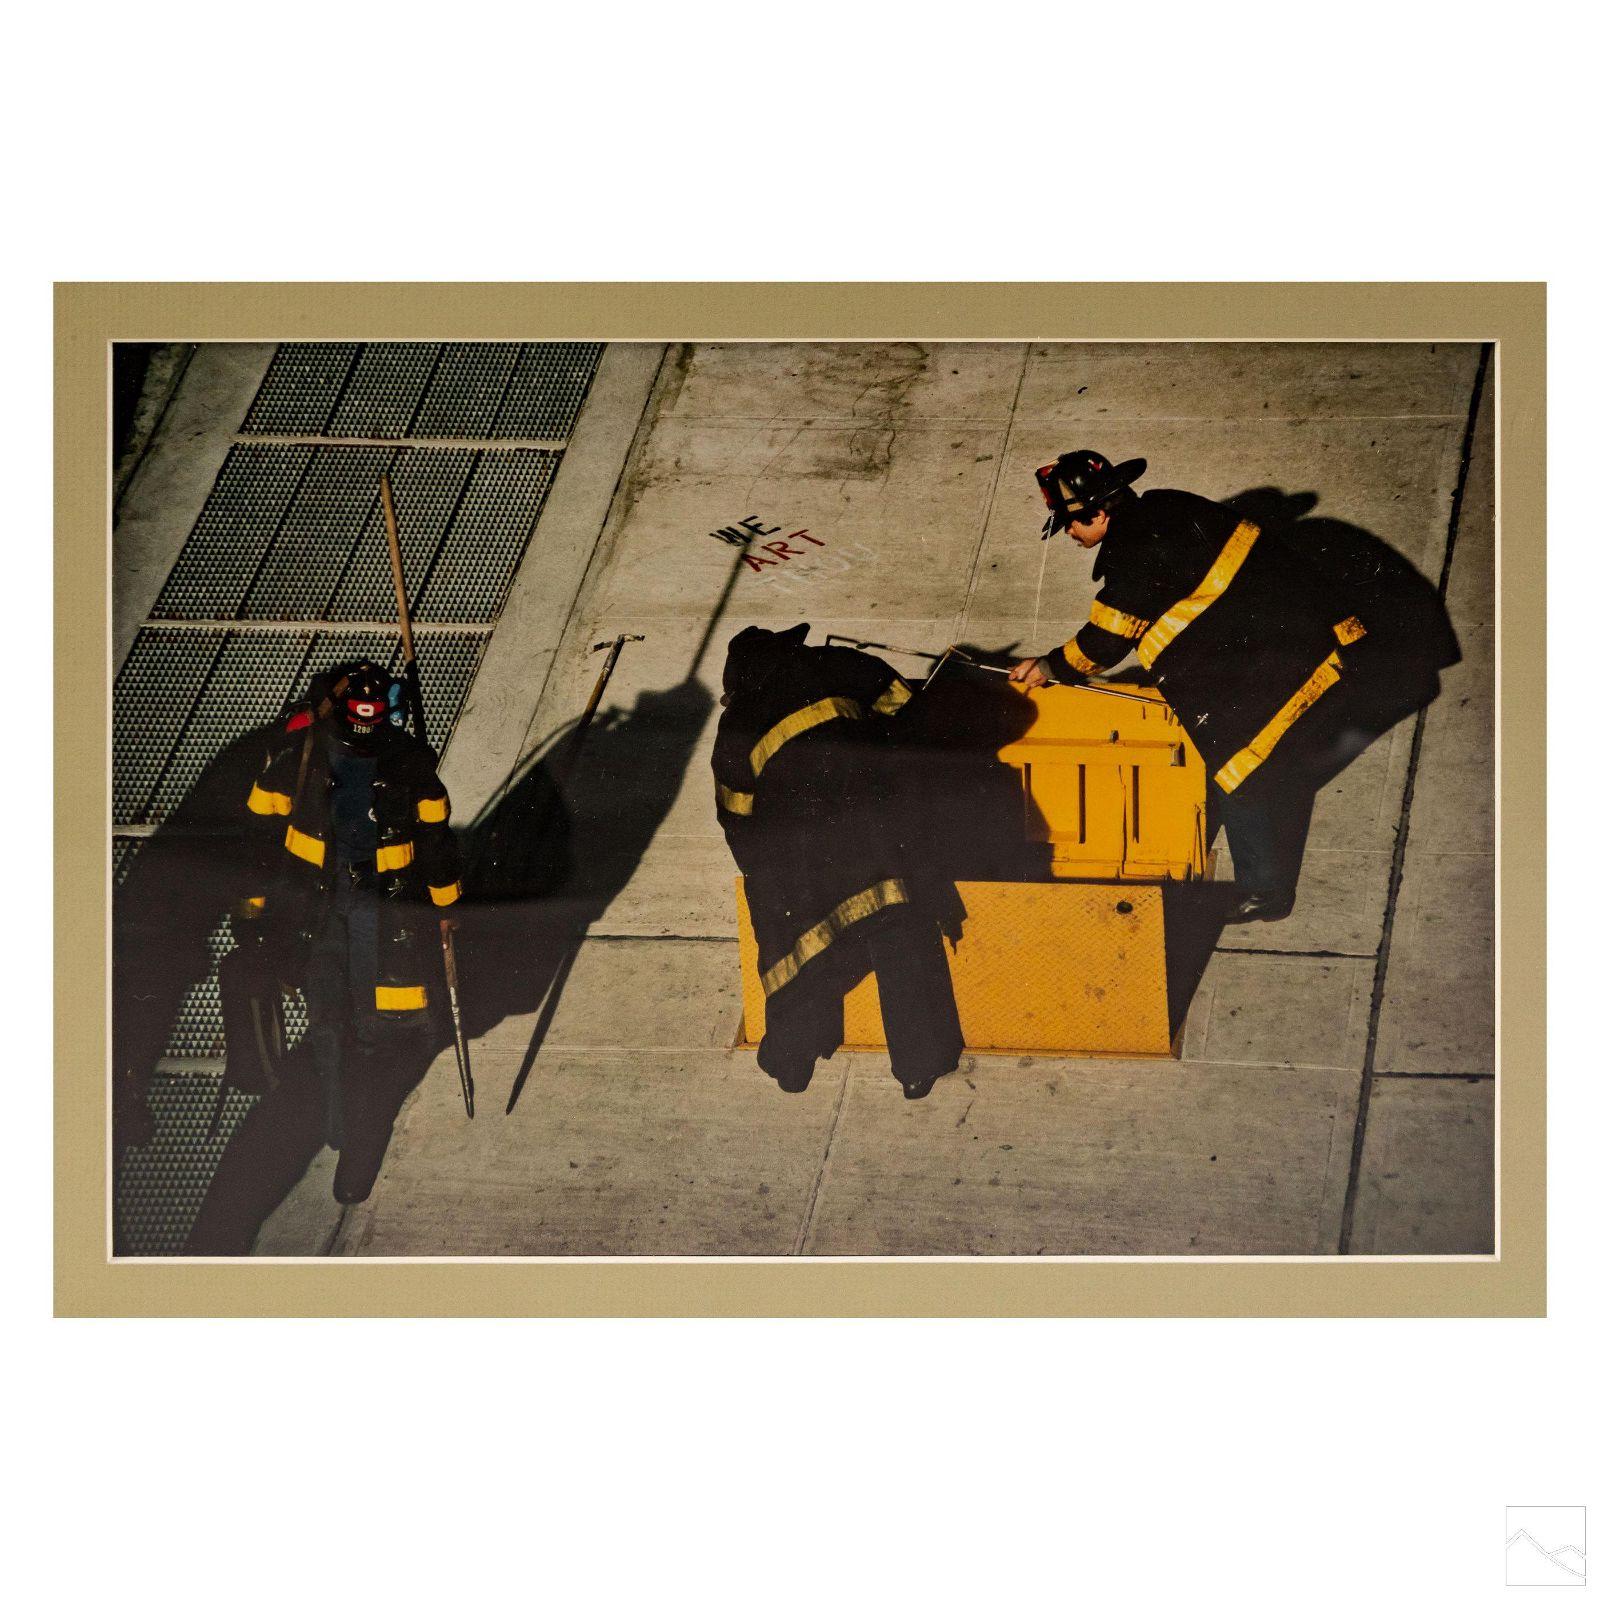 Robert Rauschenberg (1925-2008) NYC Fireman Photo